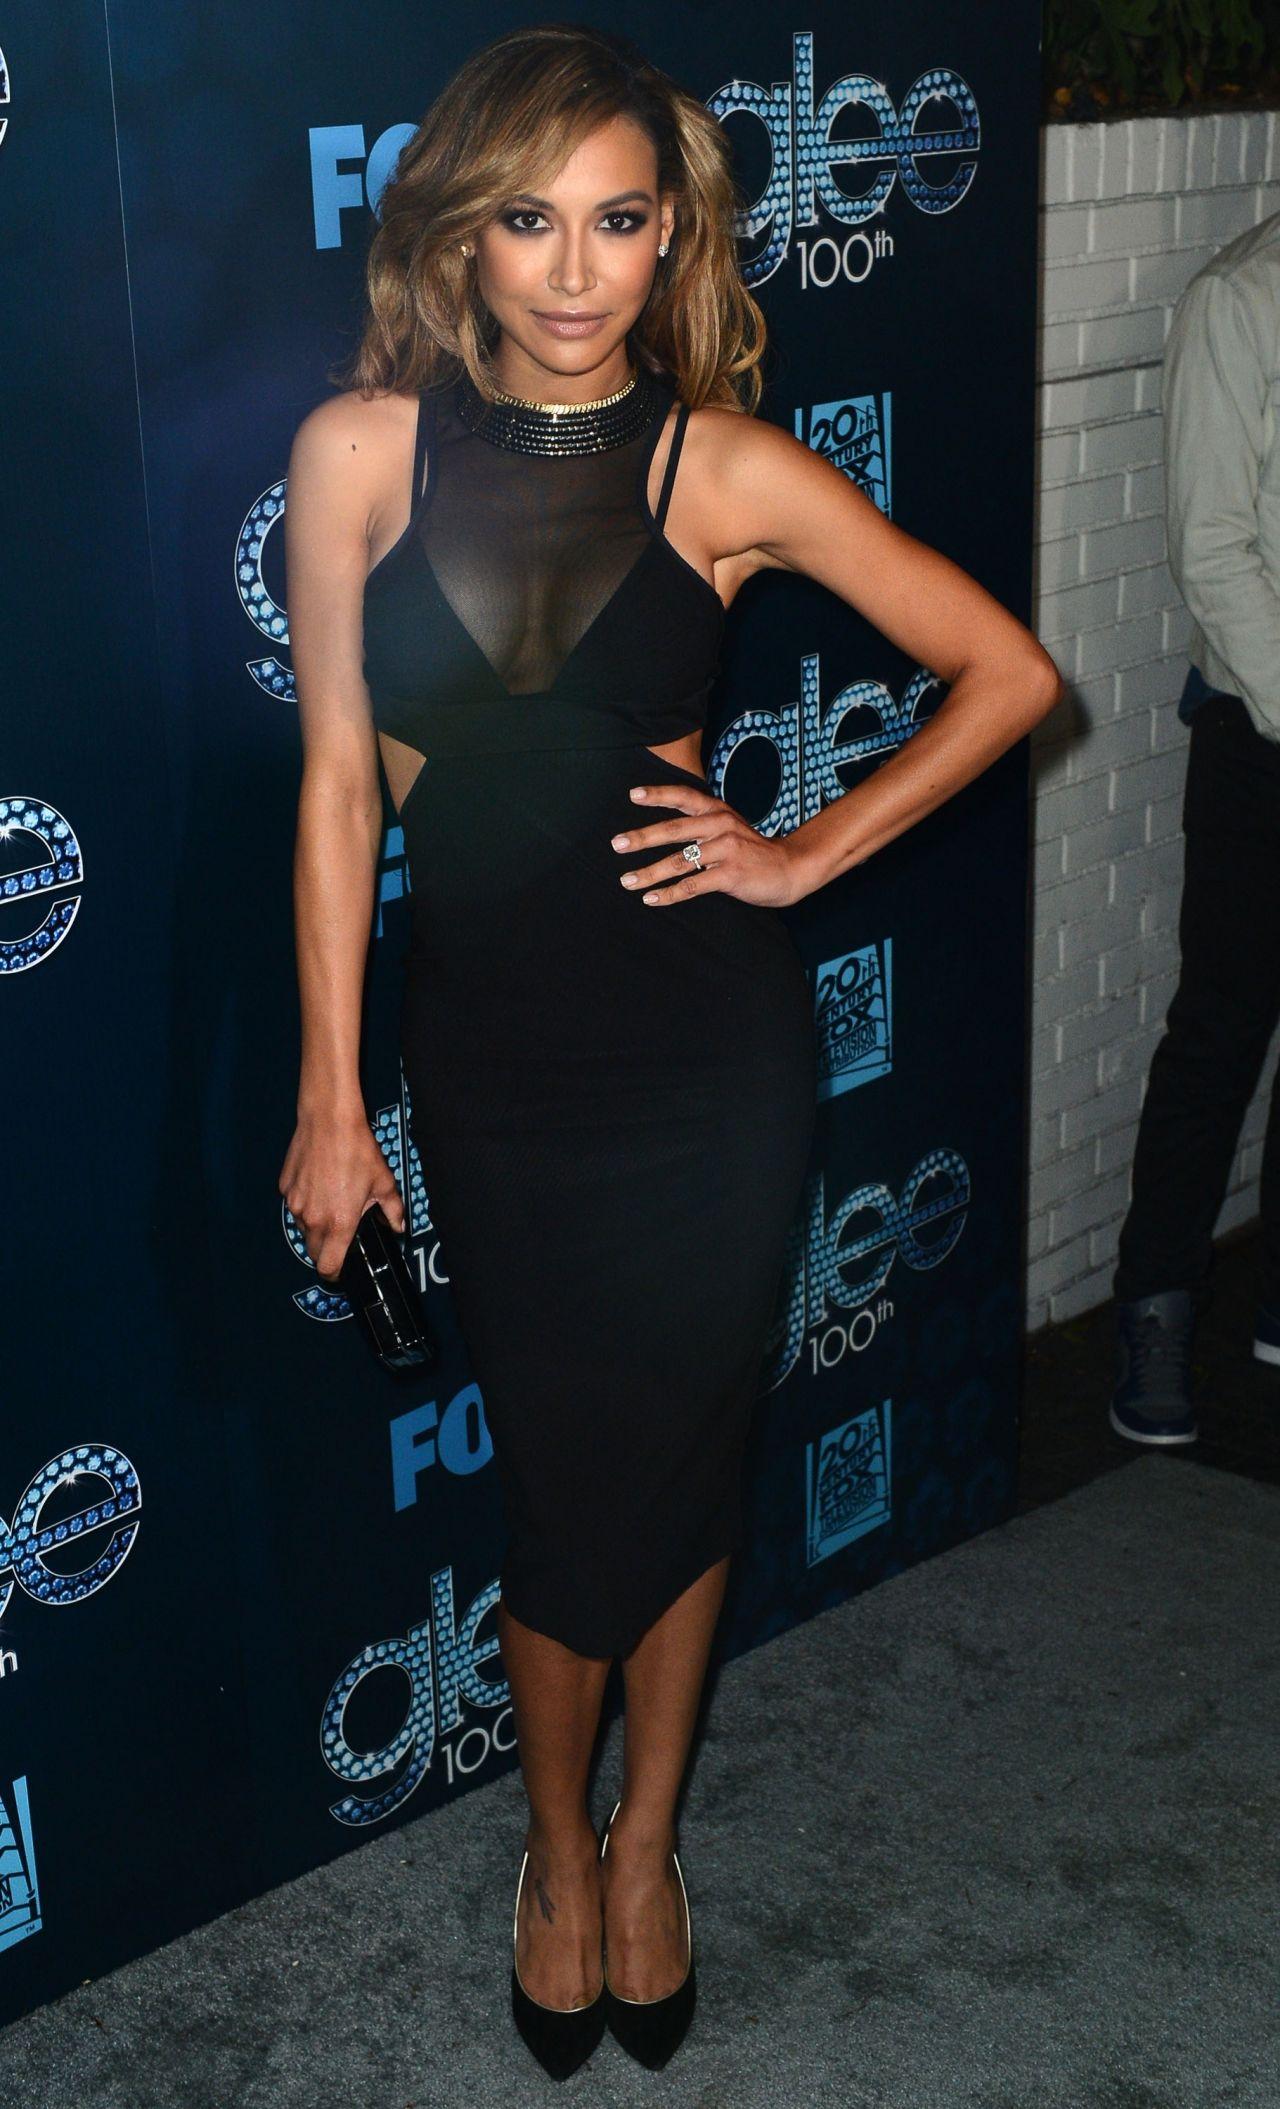 Naya Rivera at 'Glee' 100th Episode Celebration - March 2014